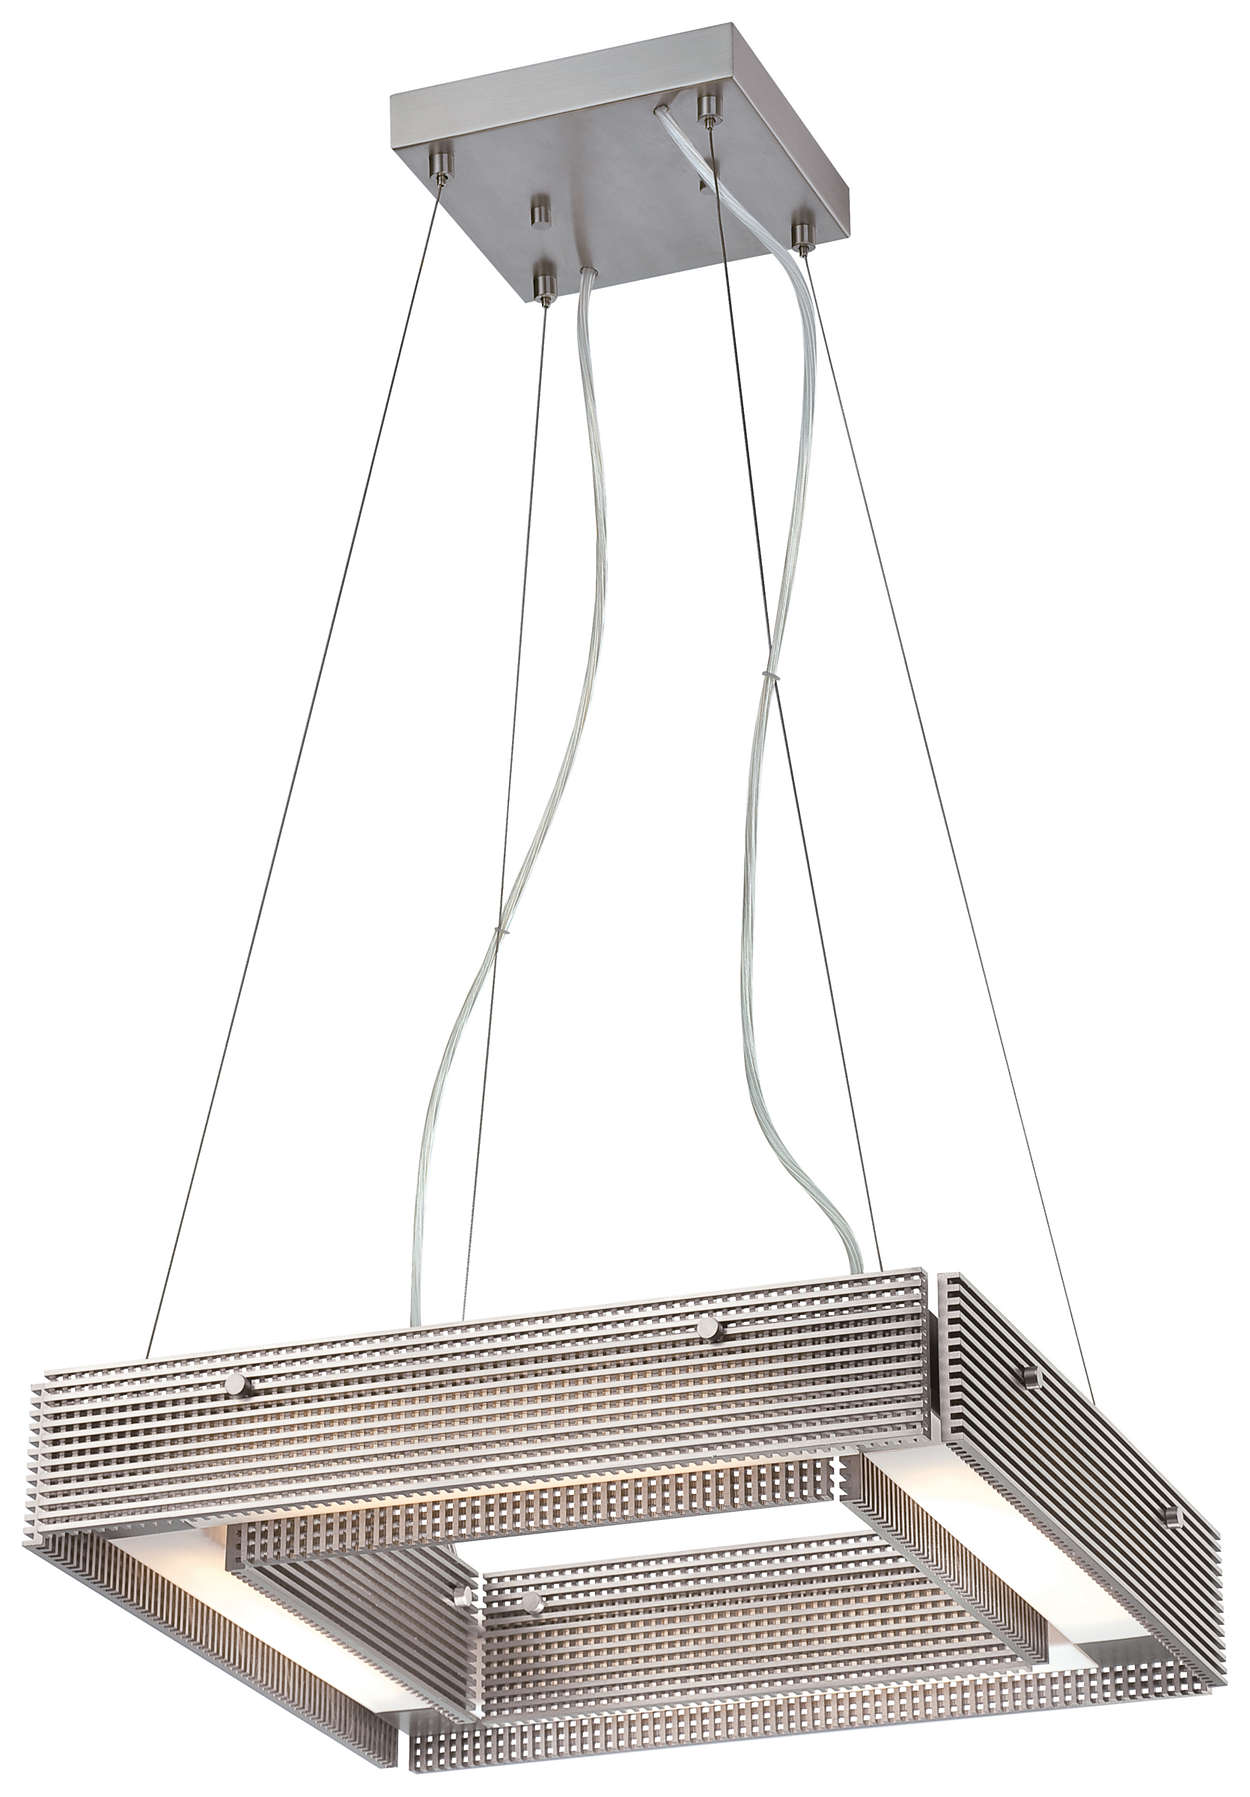 Axo 4-light Pendant in Satin Nickel finish